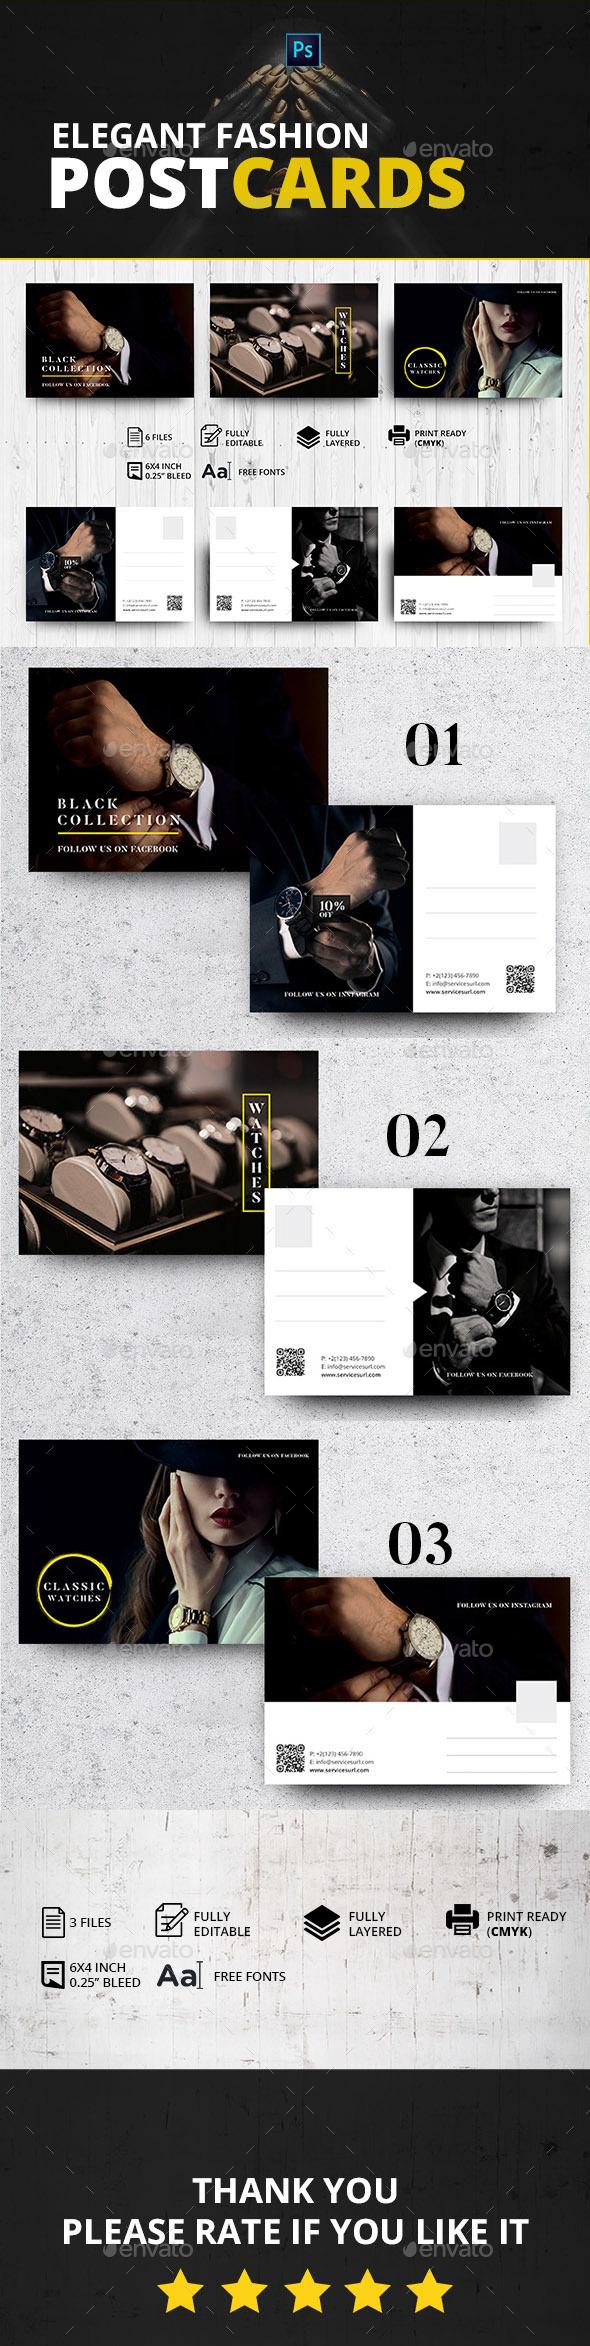 Elegant Fashion Postcards - Cards & Invites Print Templates